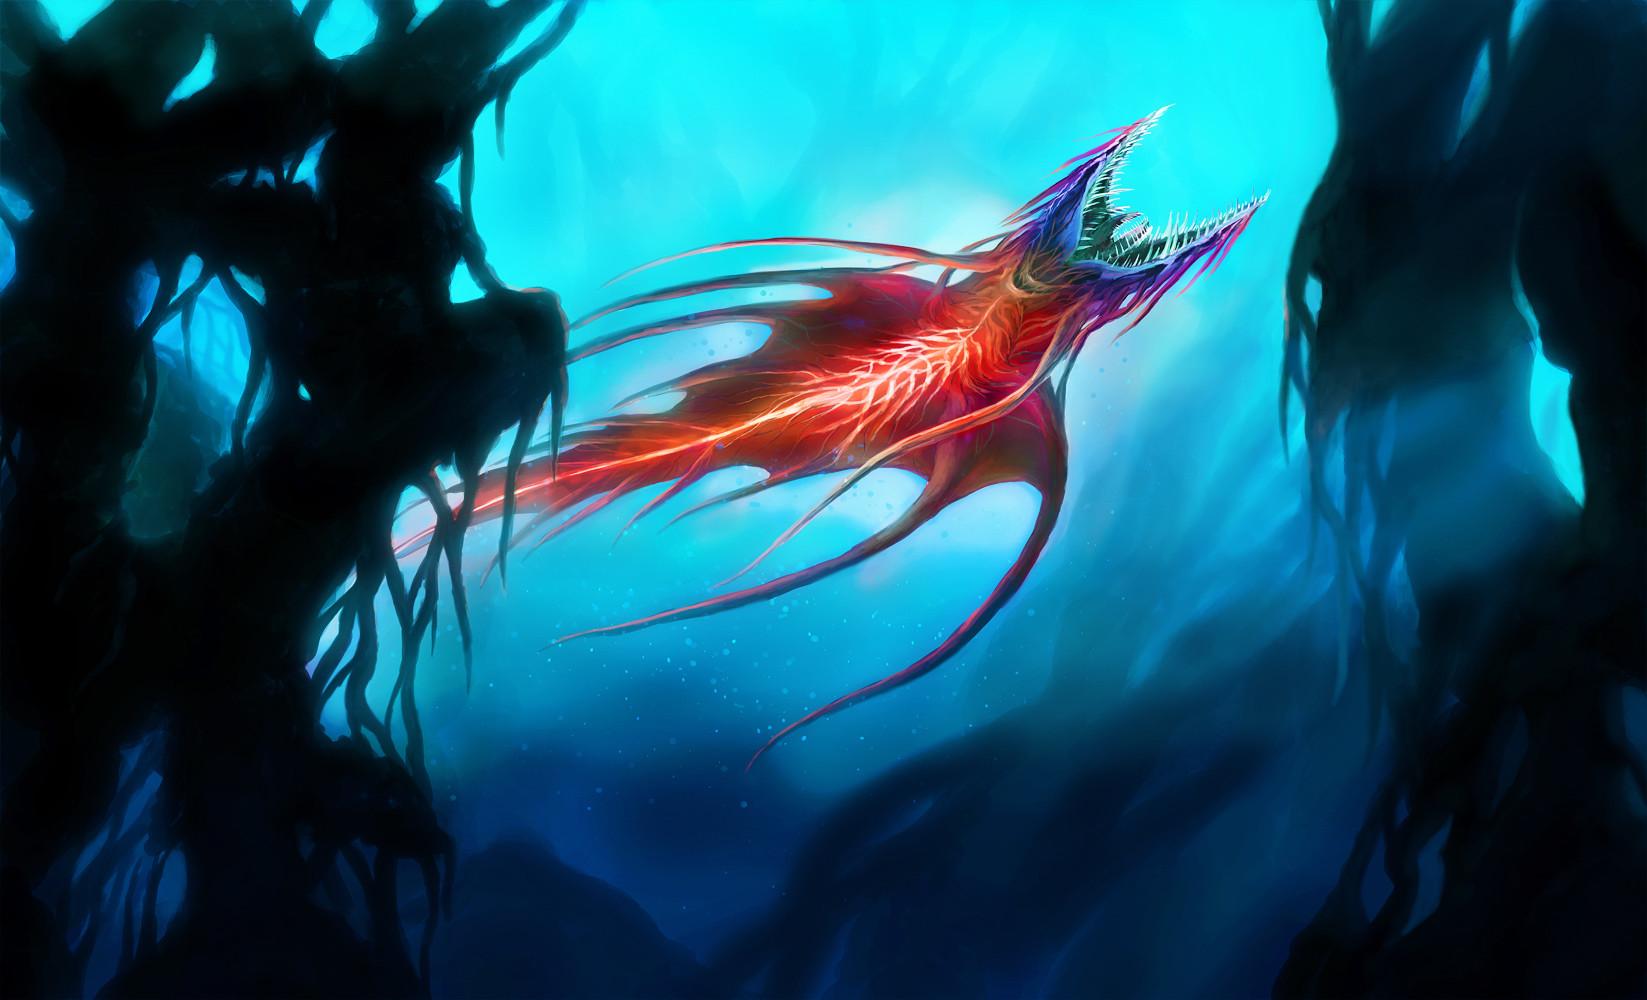 Orm irian red thunderfish by catharina wendland